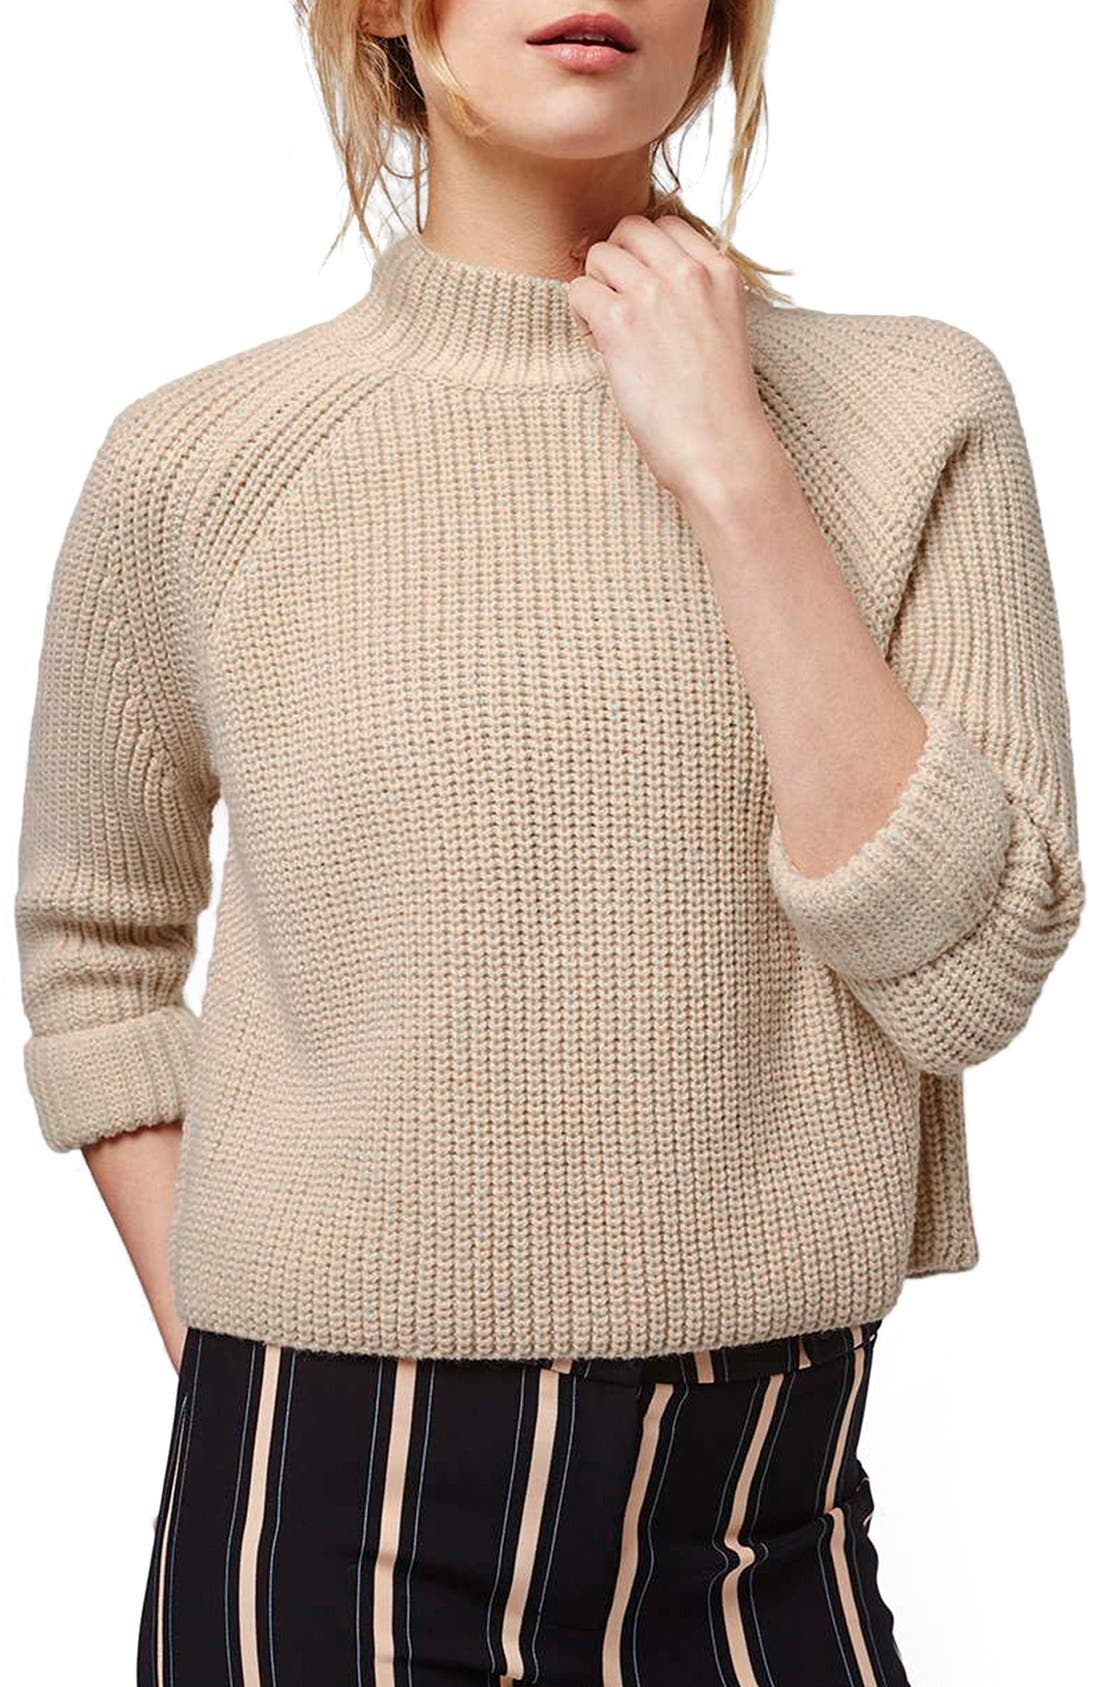 Alternate Image 1 Selected - Topshop Mock Neck Raglan Sweater (Petite)